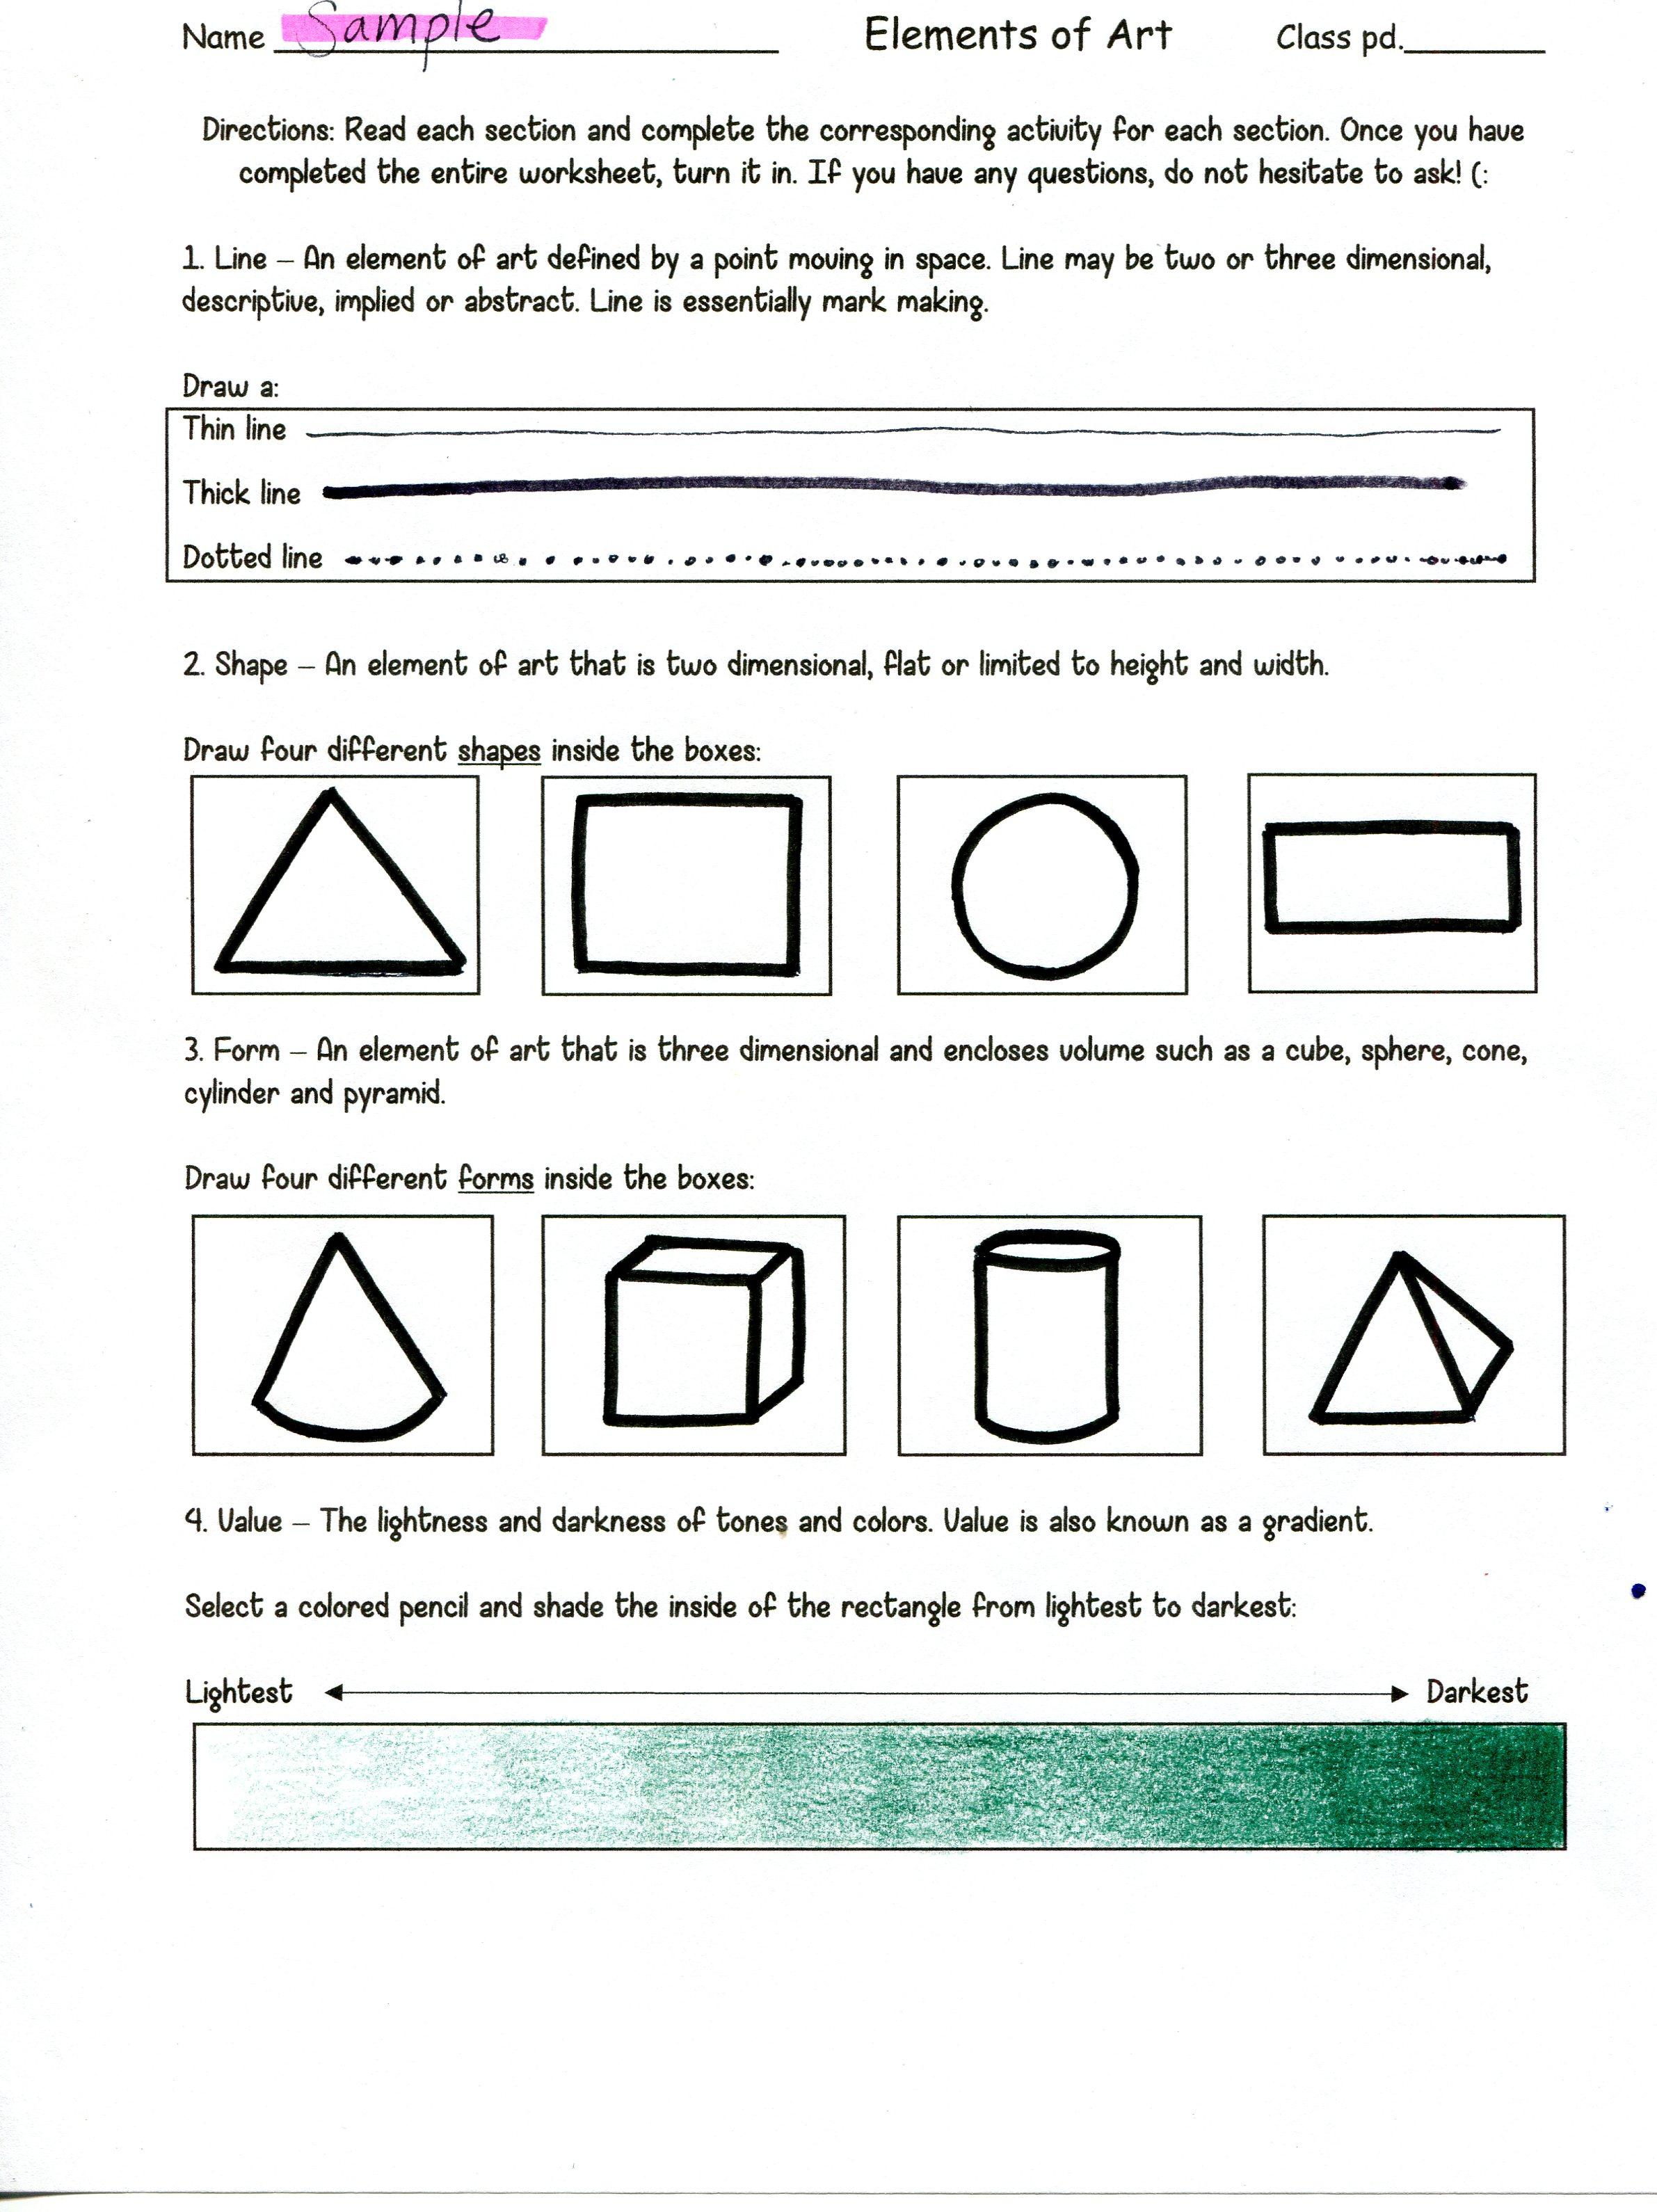 Principles Of Art Worksheet